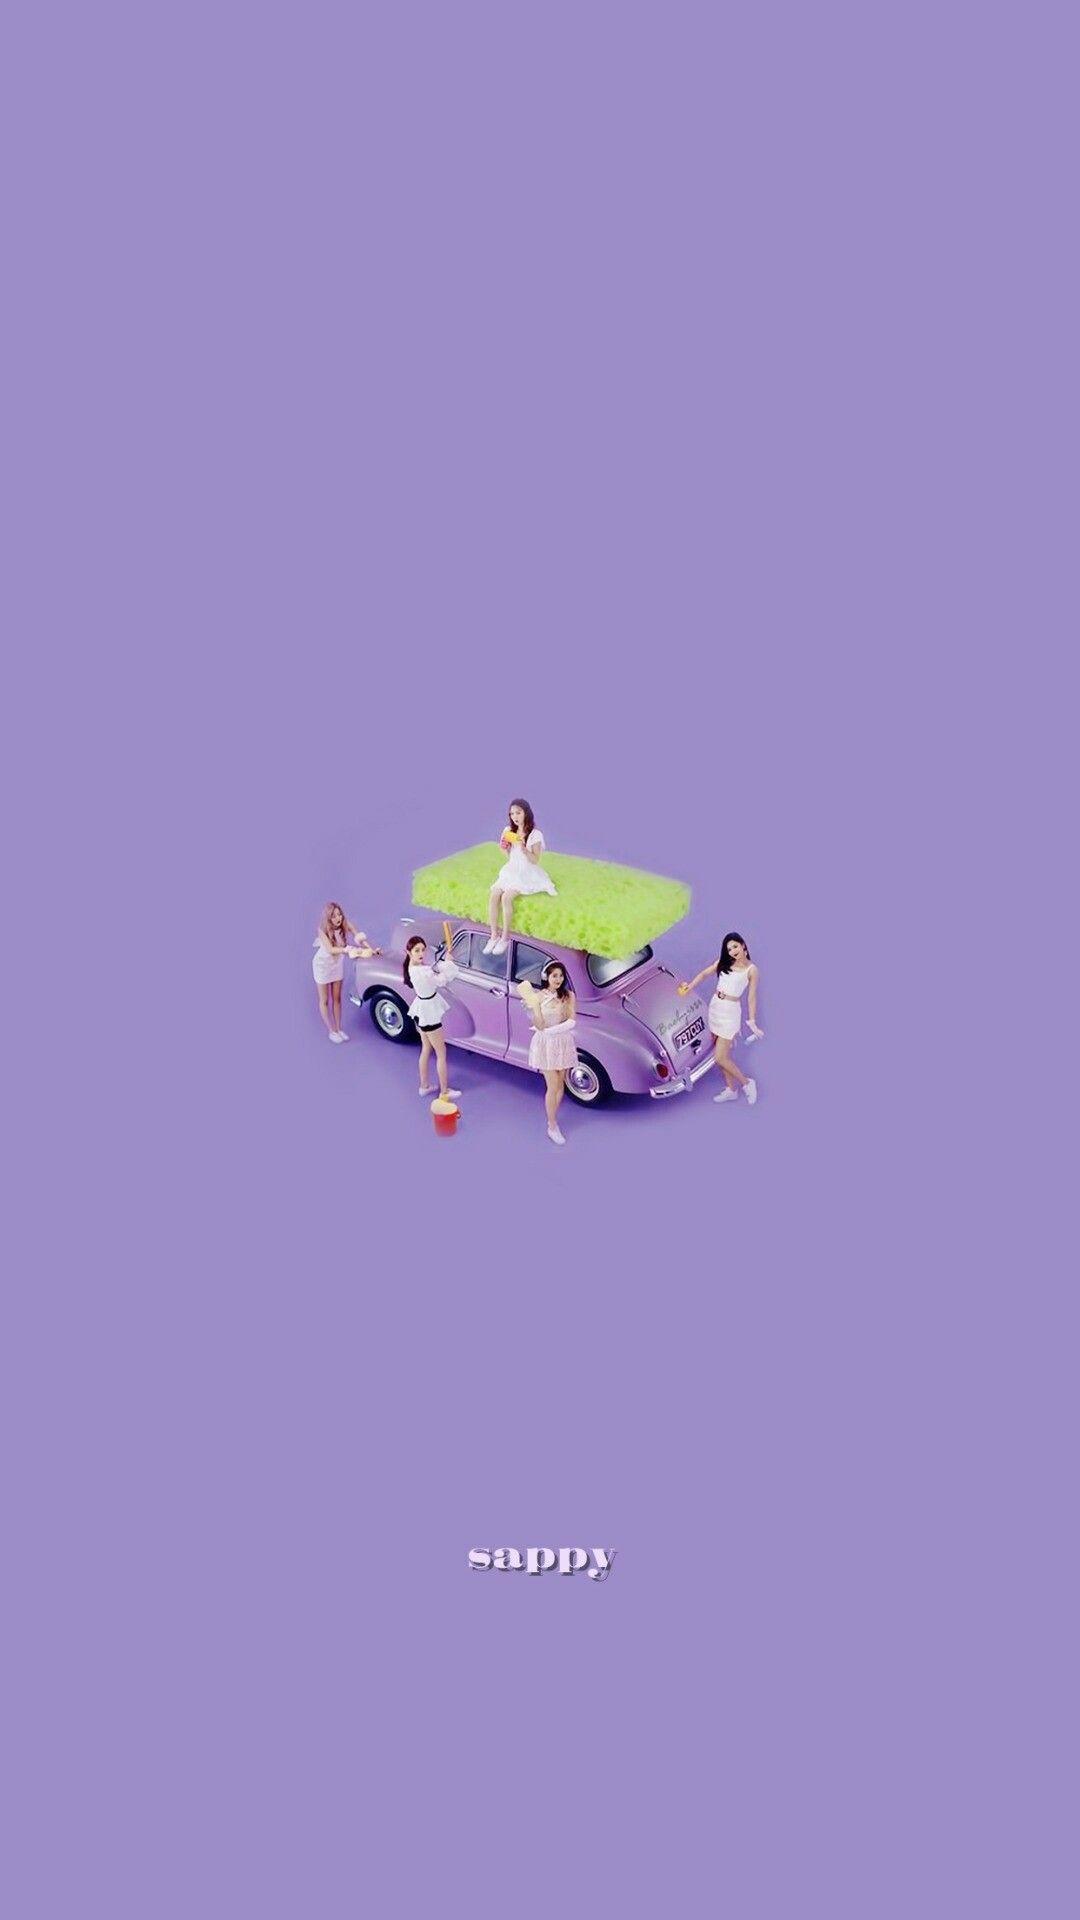 Red Velvet Sappy Backgrounds Wallpaper Lockscreen Fondo De Pantalla Hd Iphone Seulgi Joy Irene Wendy Yeri Kertas Dinding Gambar Karakter Gambar